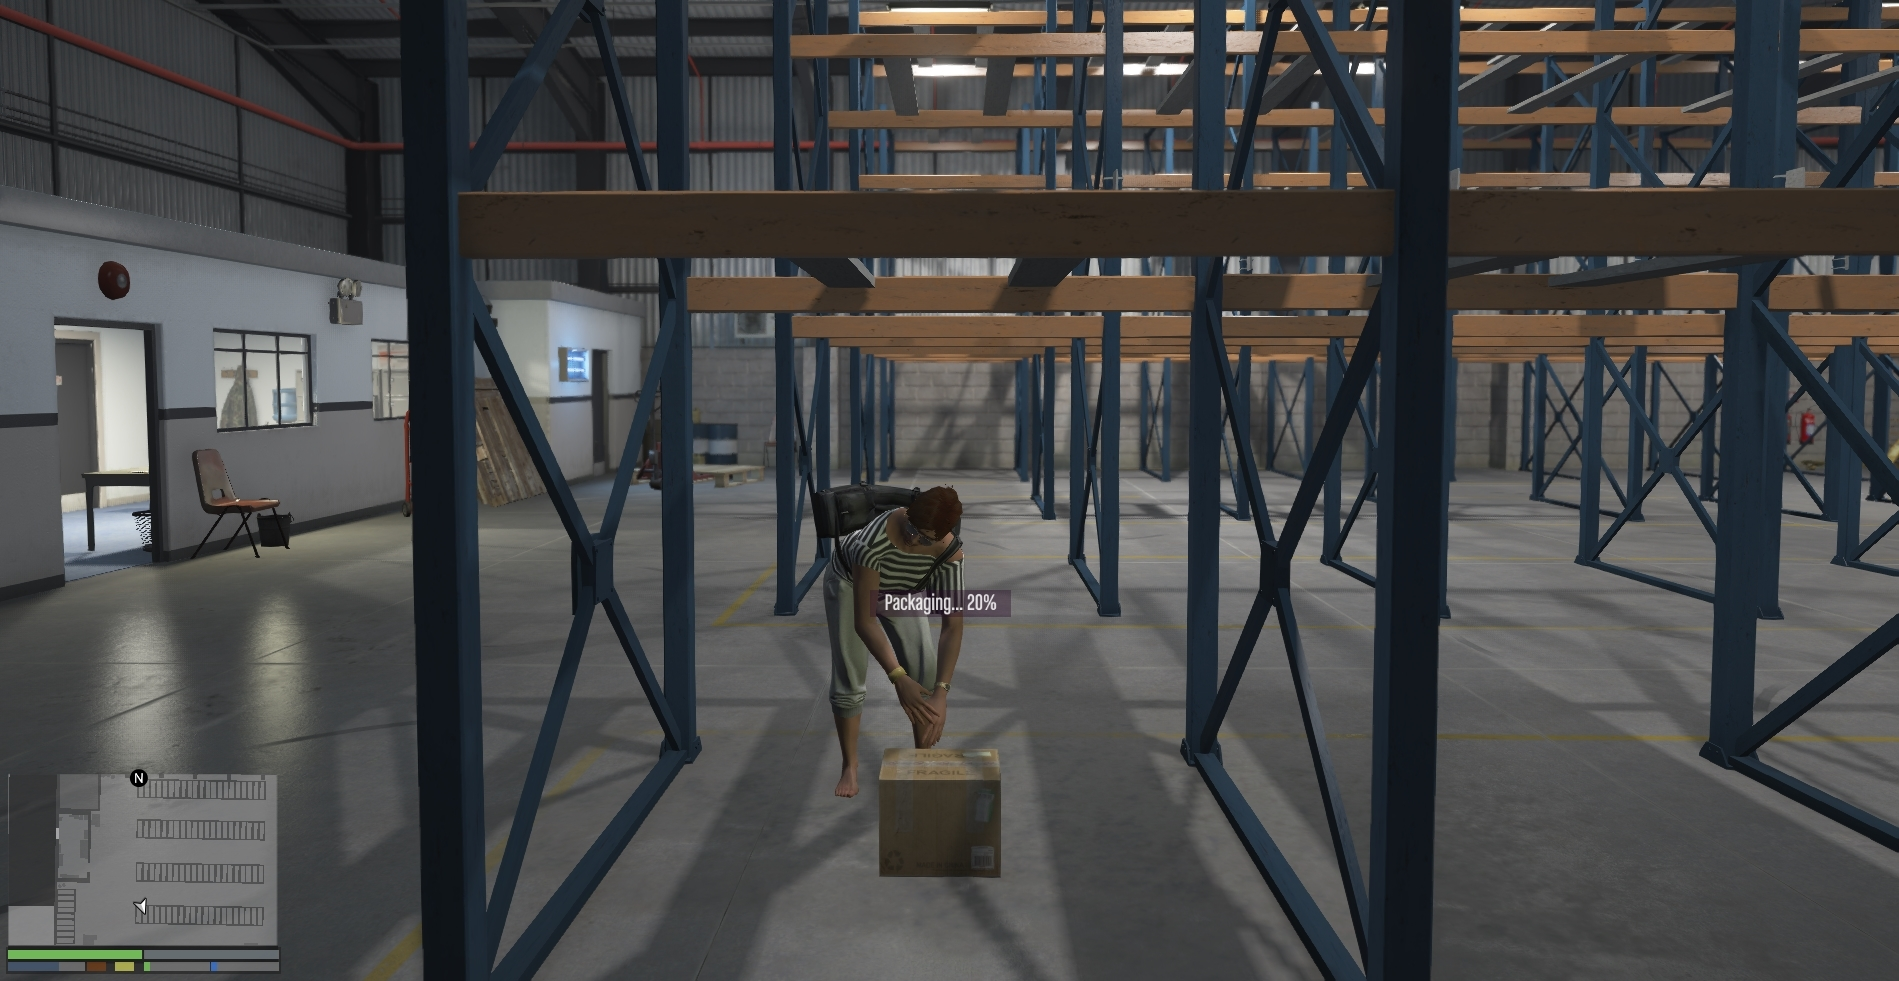 Release-ESX Jail] Prisonwork, Anti Combat Log, Mugshot Photo